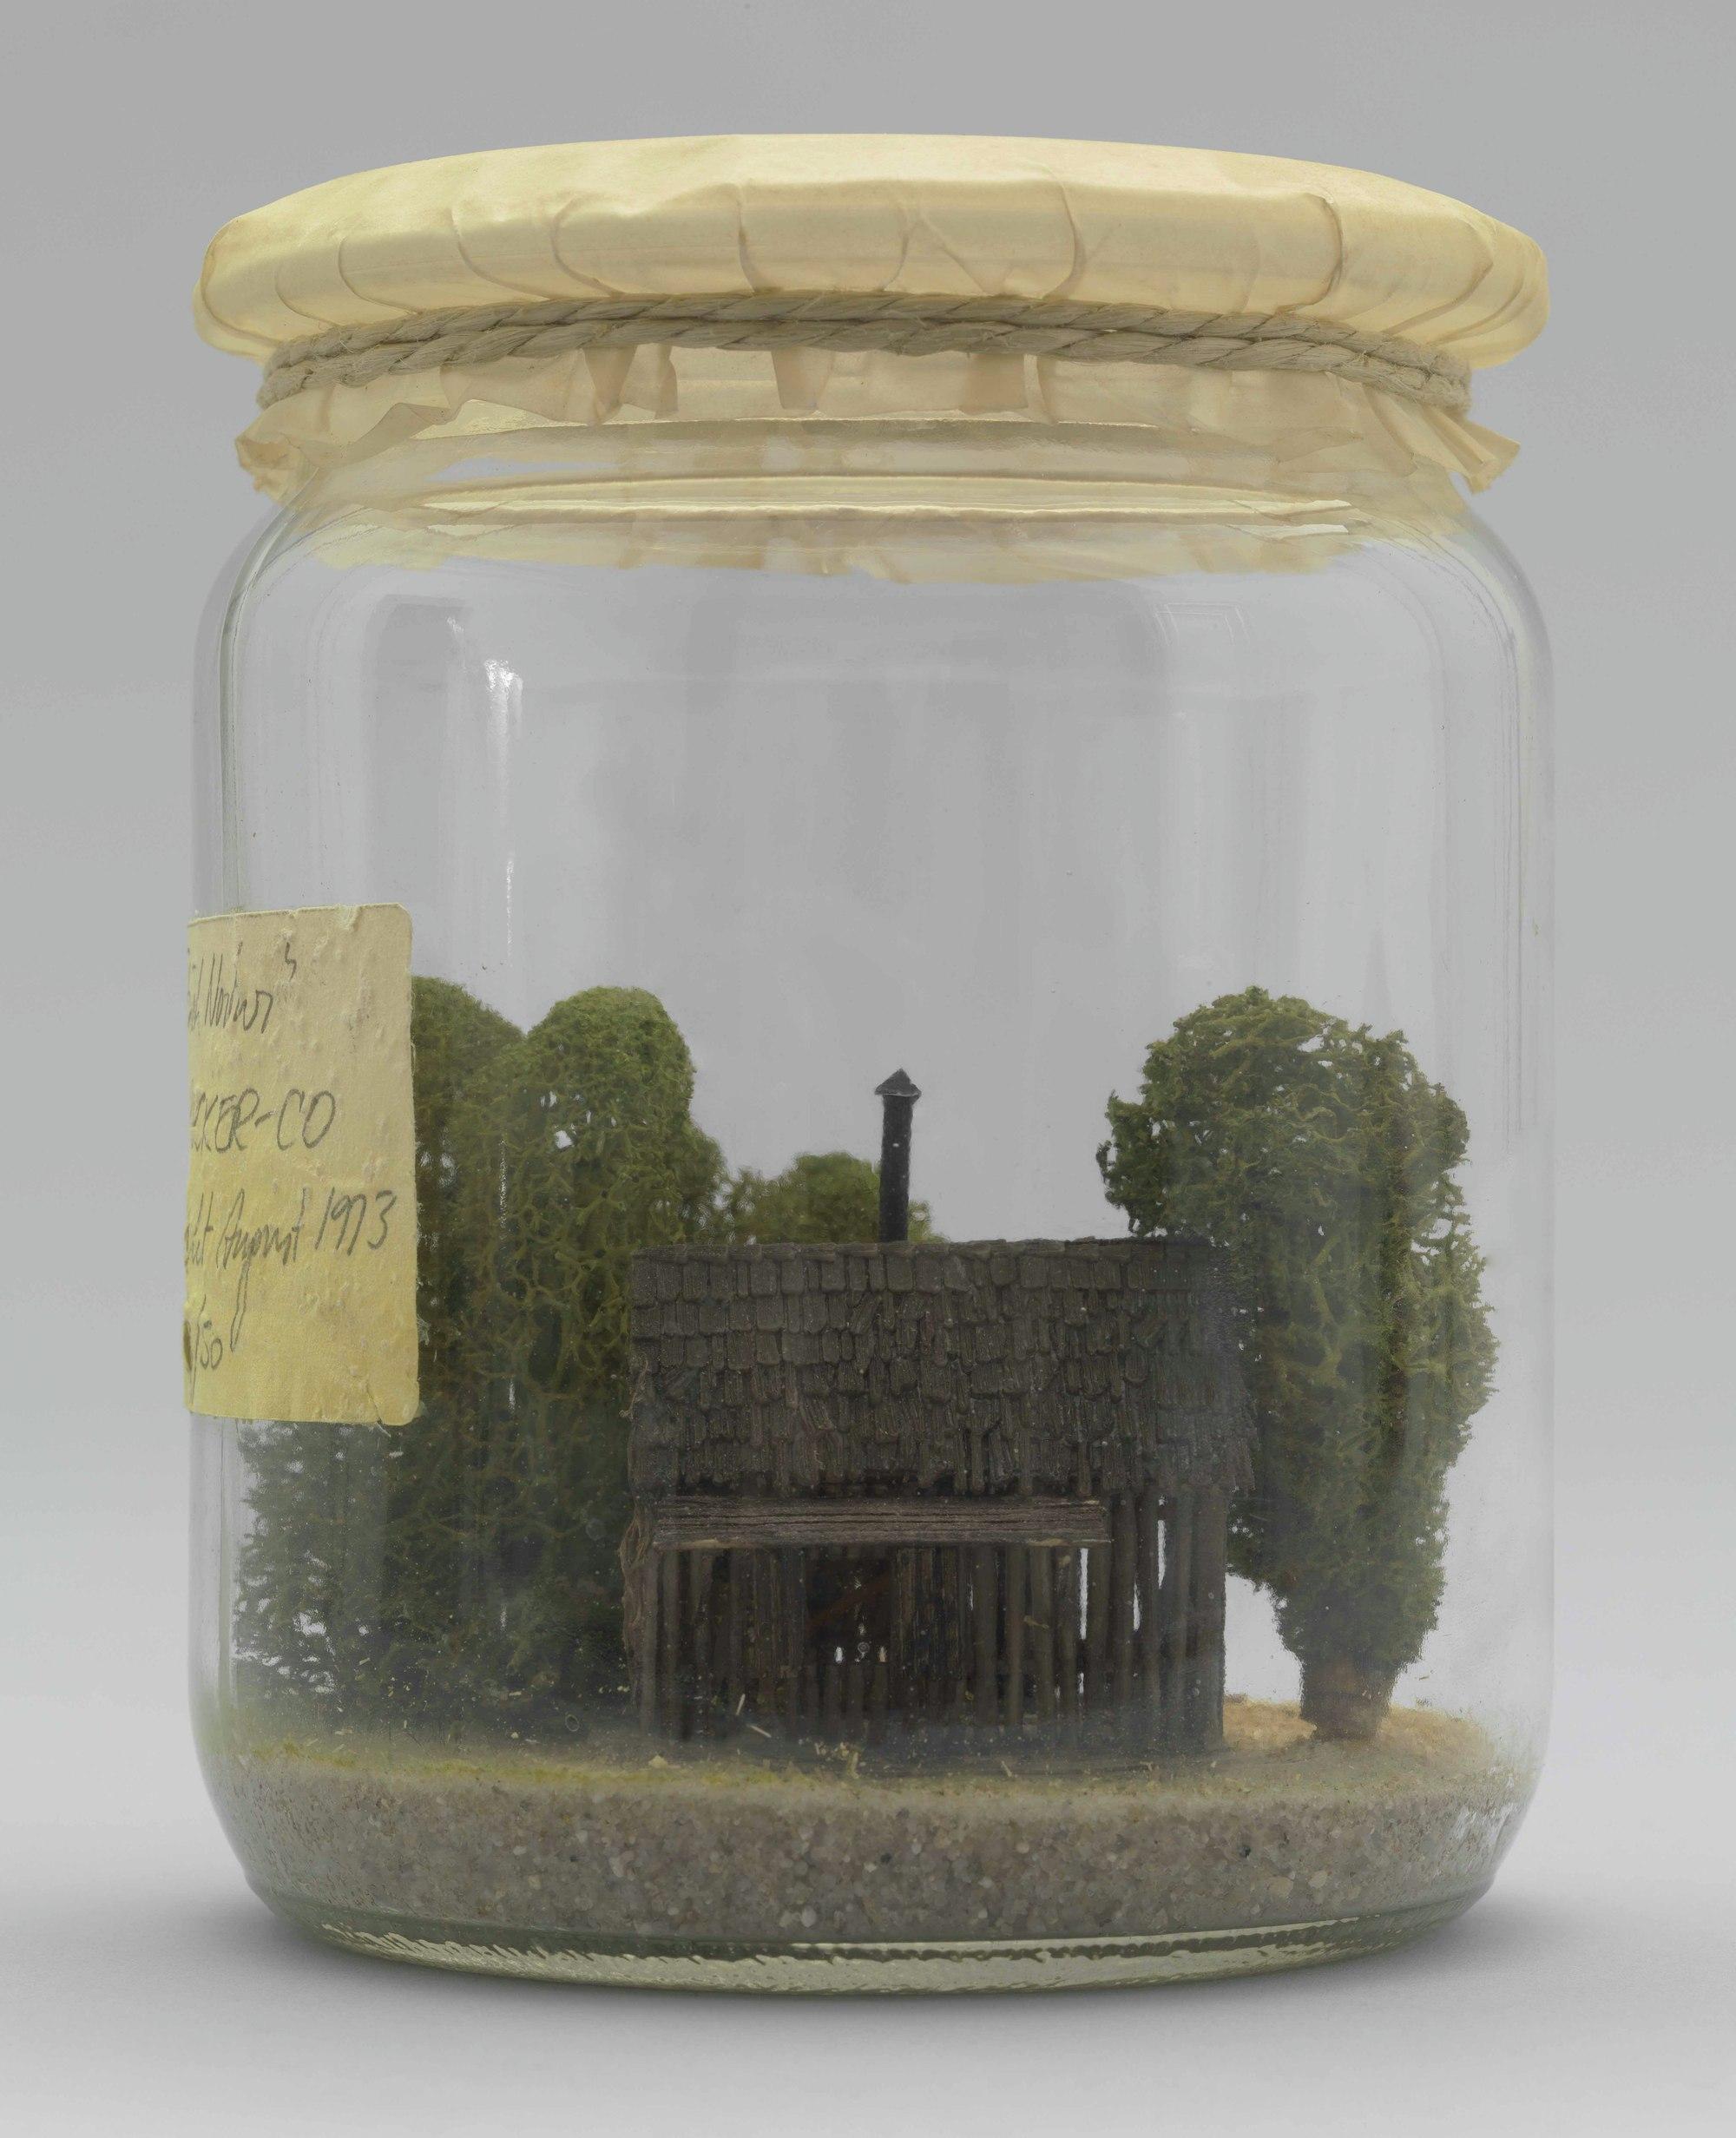 Haus Rucker Cou0027s Stück Natur (Piece Of Nature) (1973).